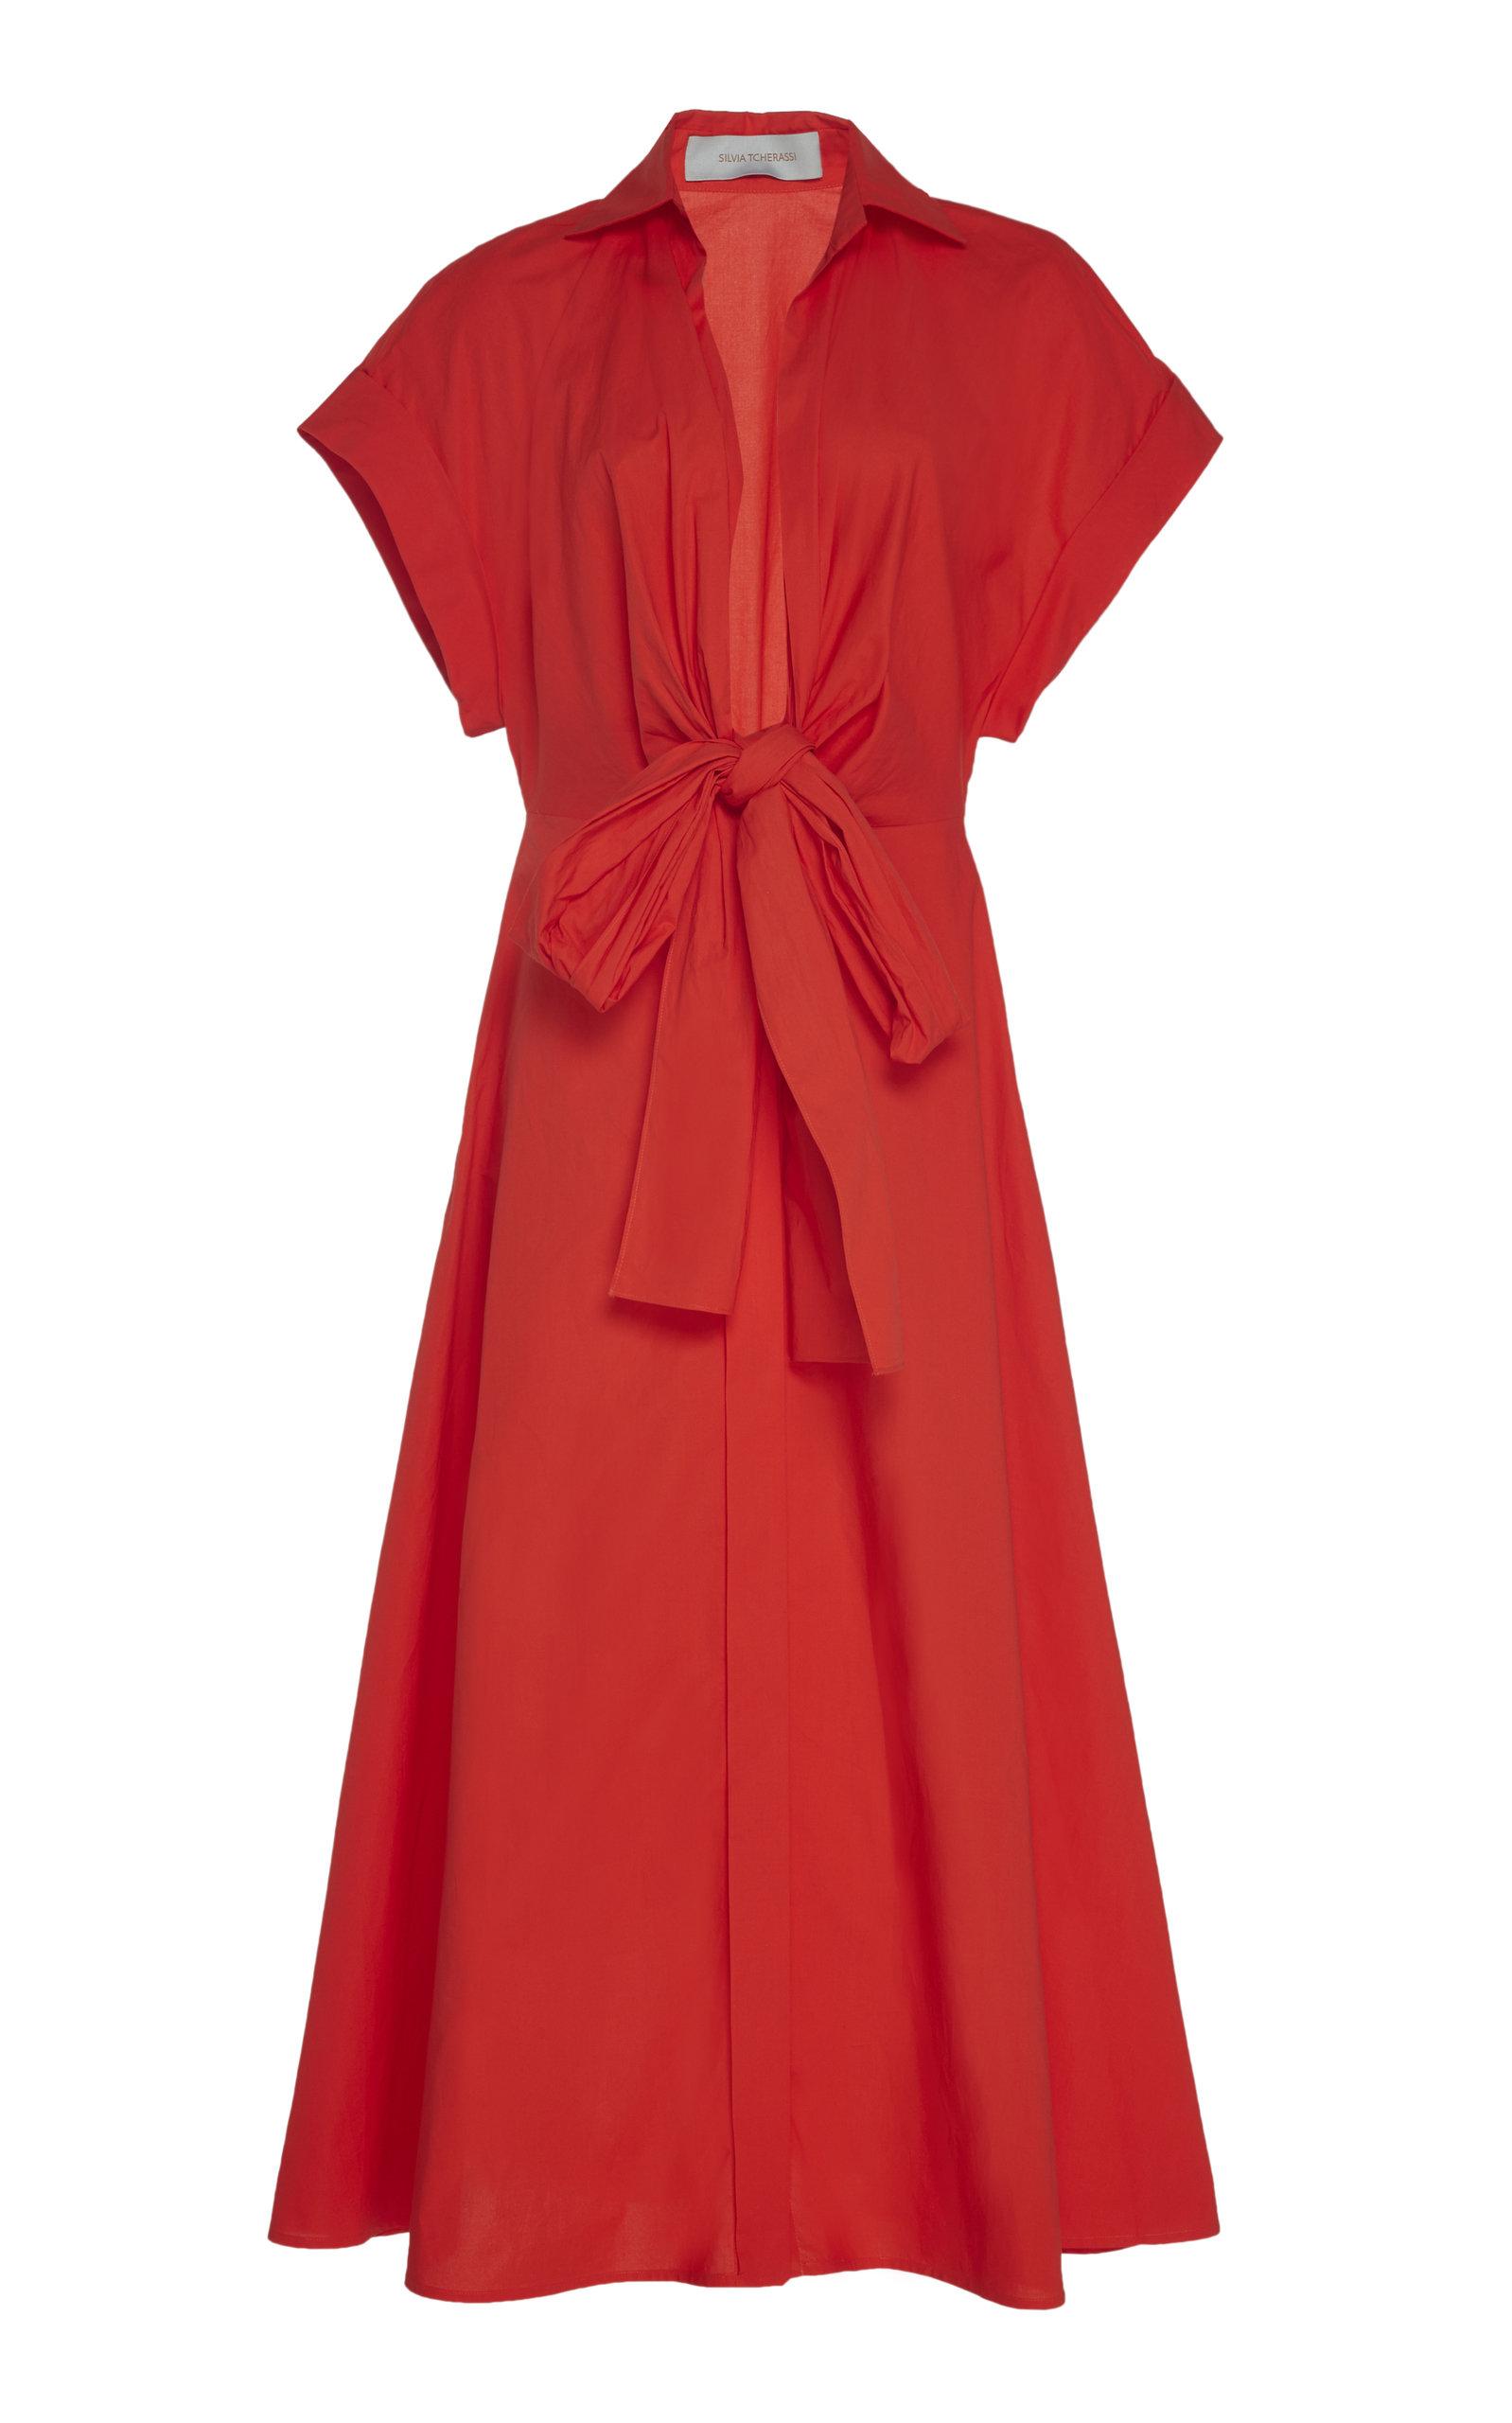 Buy Silvia Tcherassi Sampuesana Tie-Detailed Cotton-Poplin Midi Dress online, shop Silvia Tcherassi at the best price